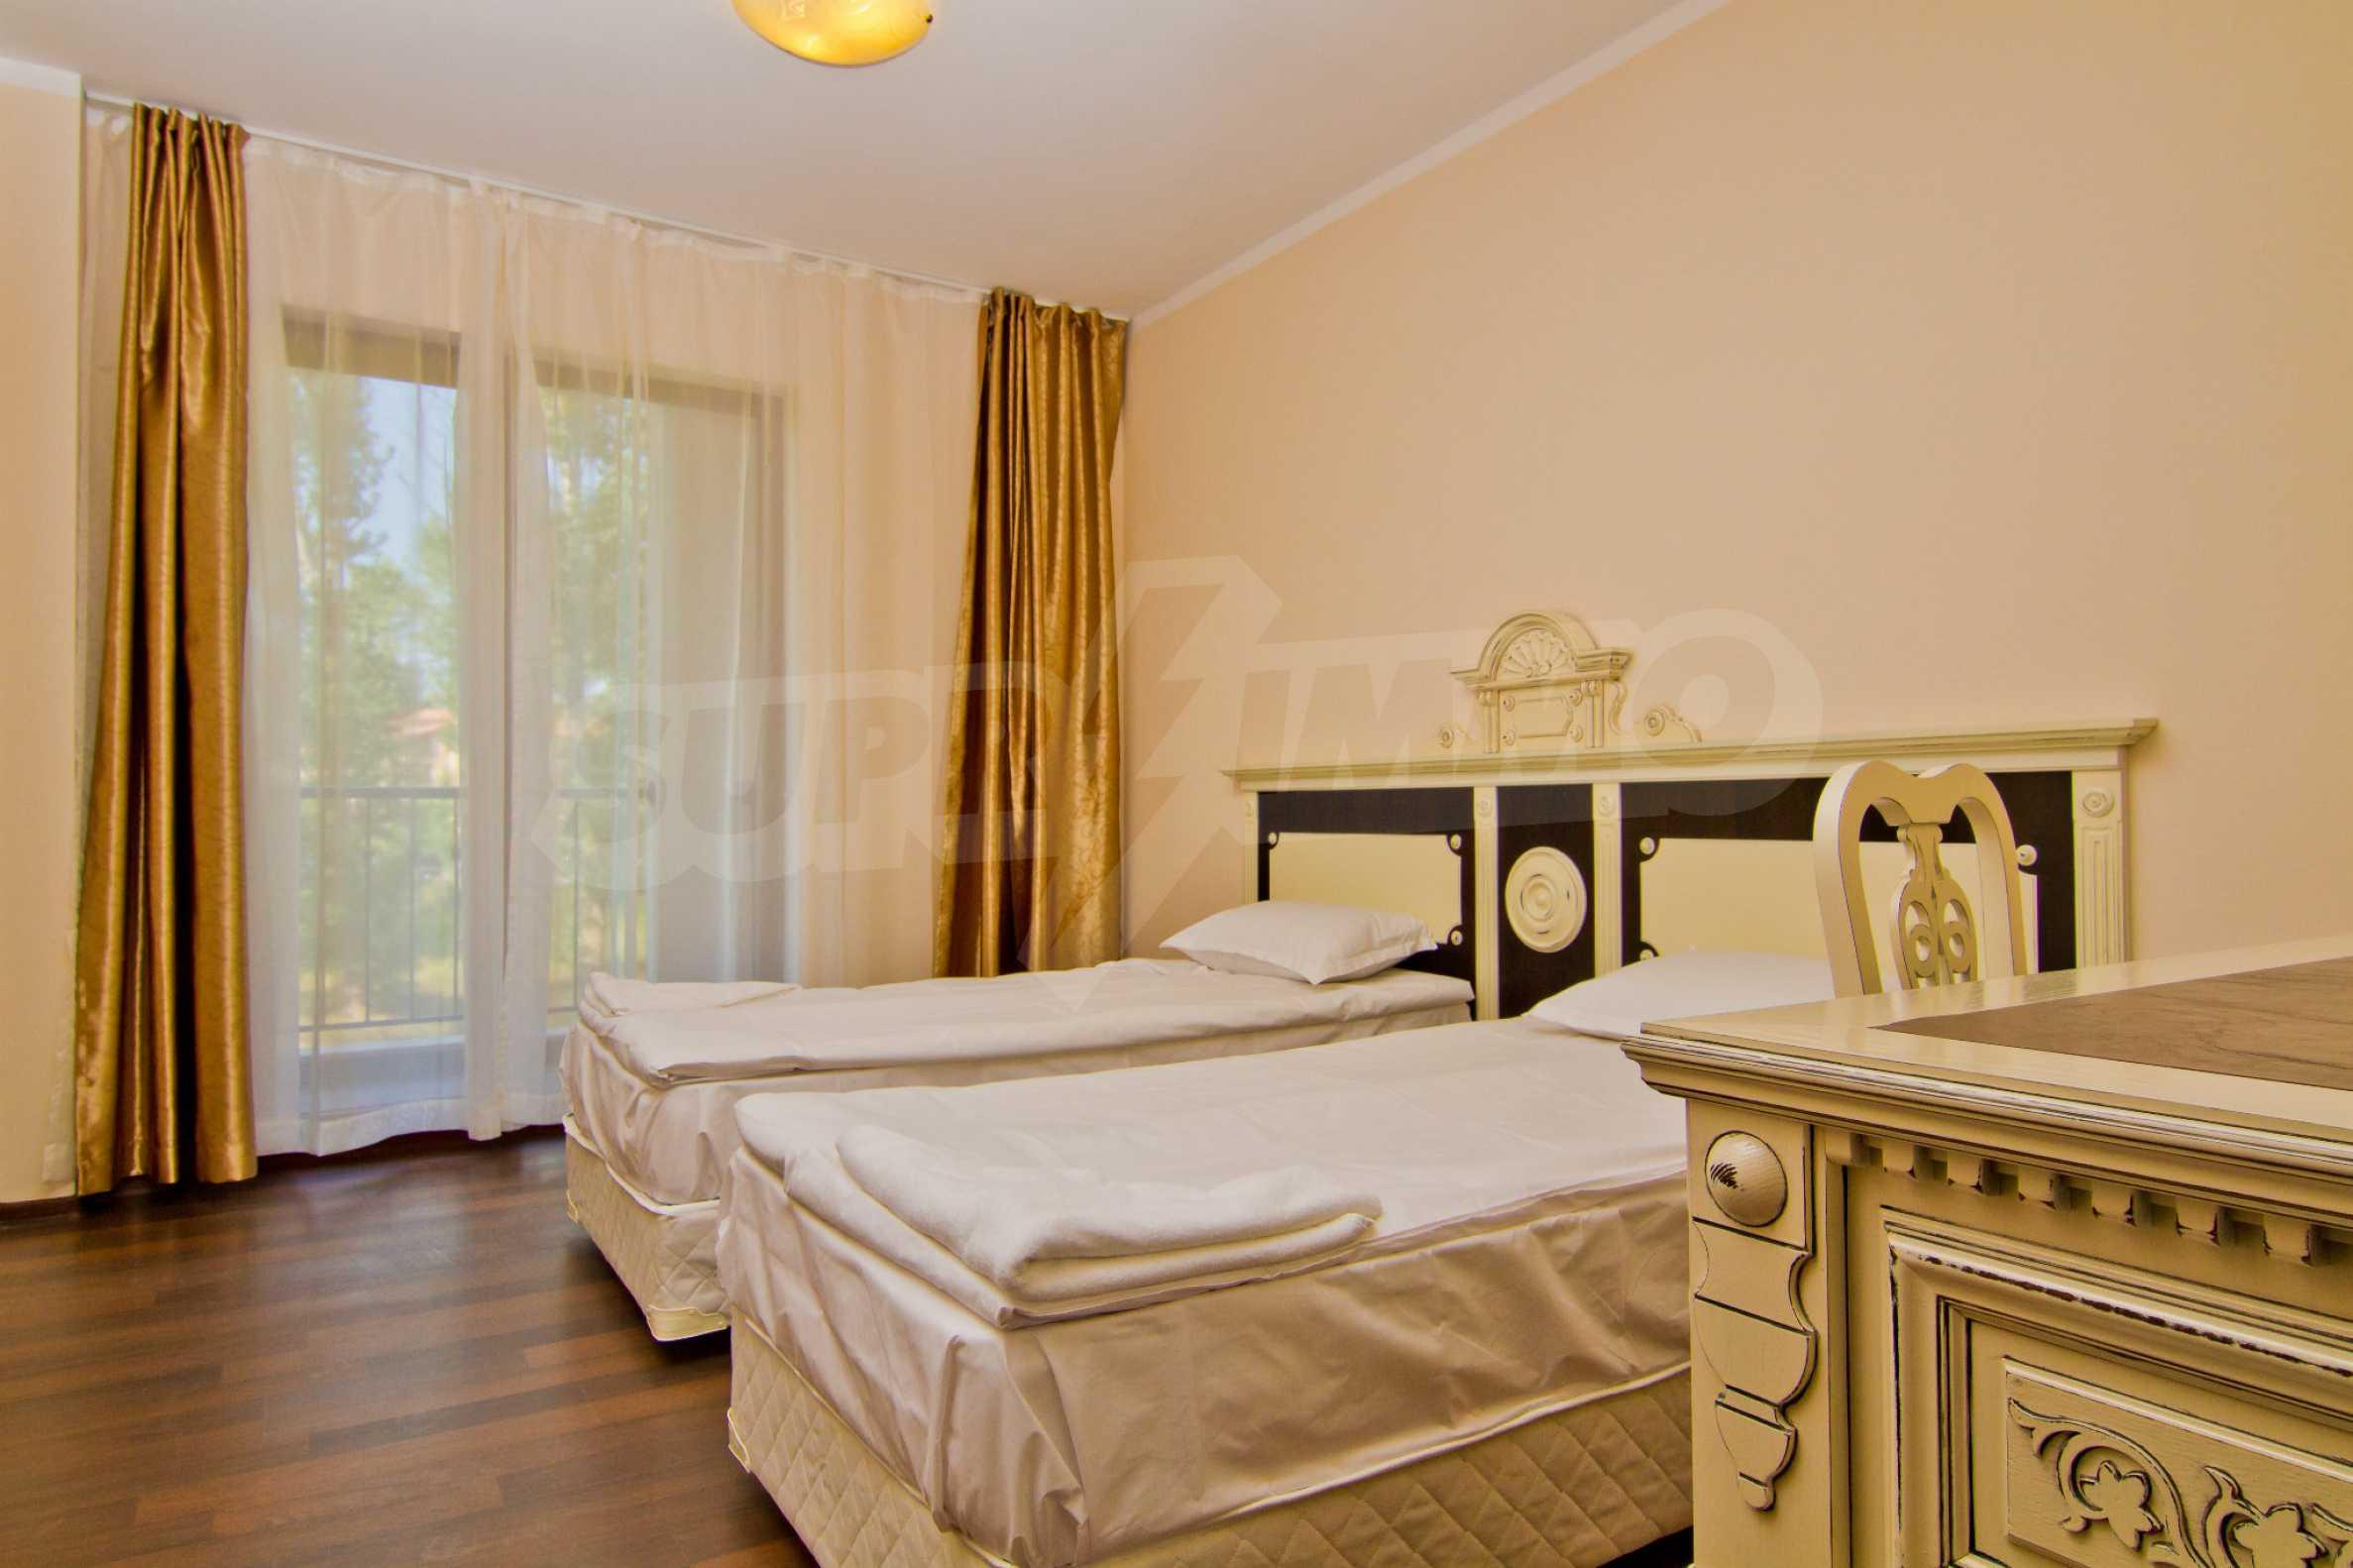 Примеа Бийч Резиденс / Primea Beach Residence 34